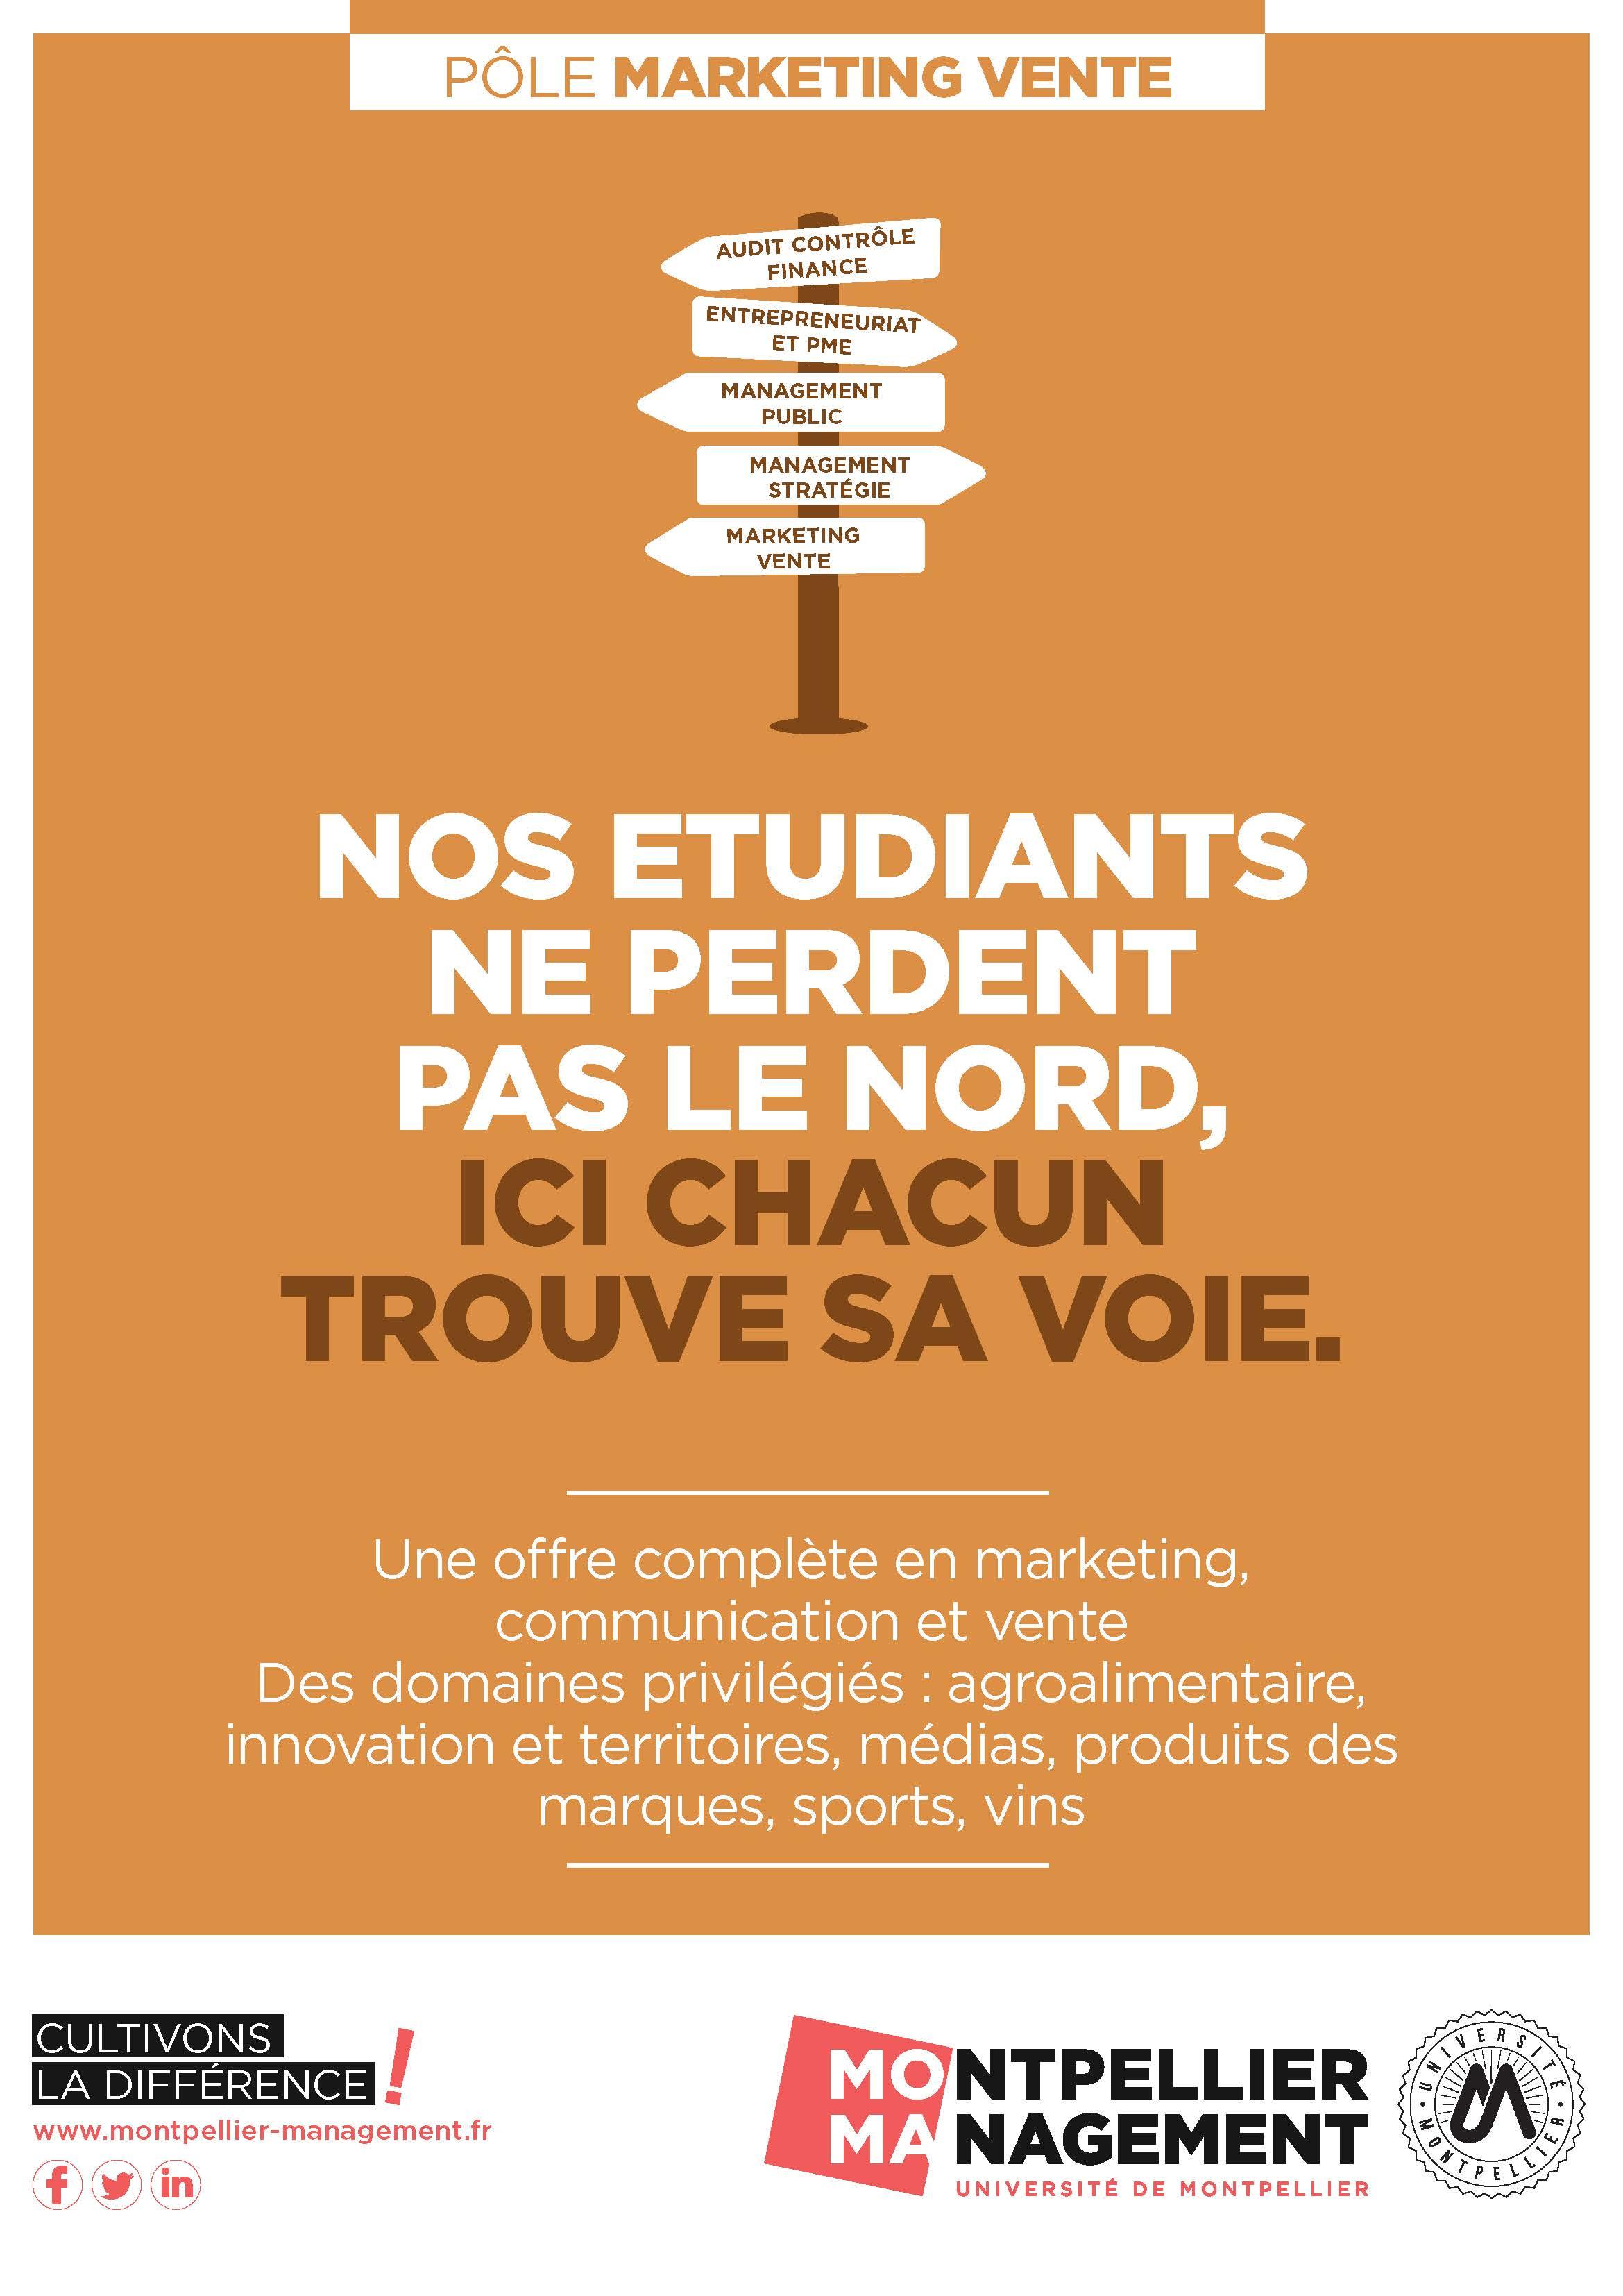 Pole Marketing Vente - Montpellier Management